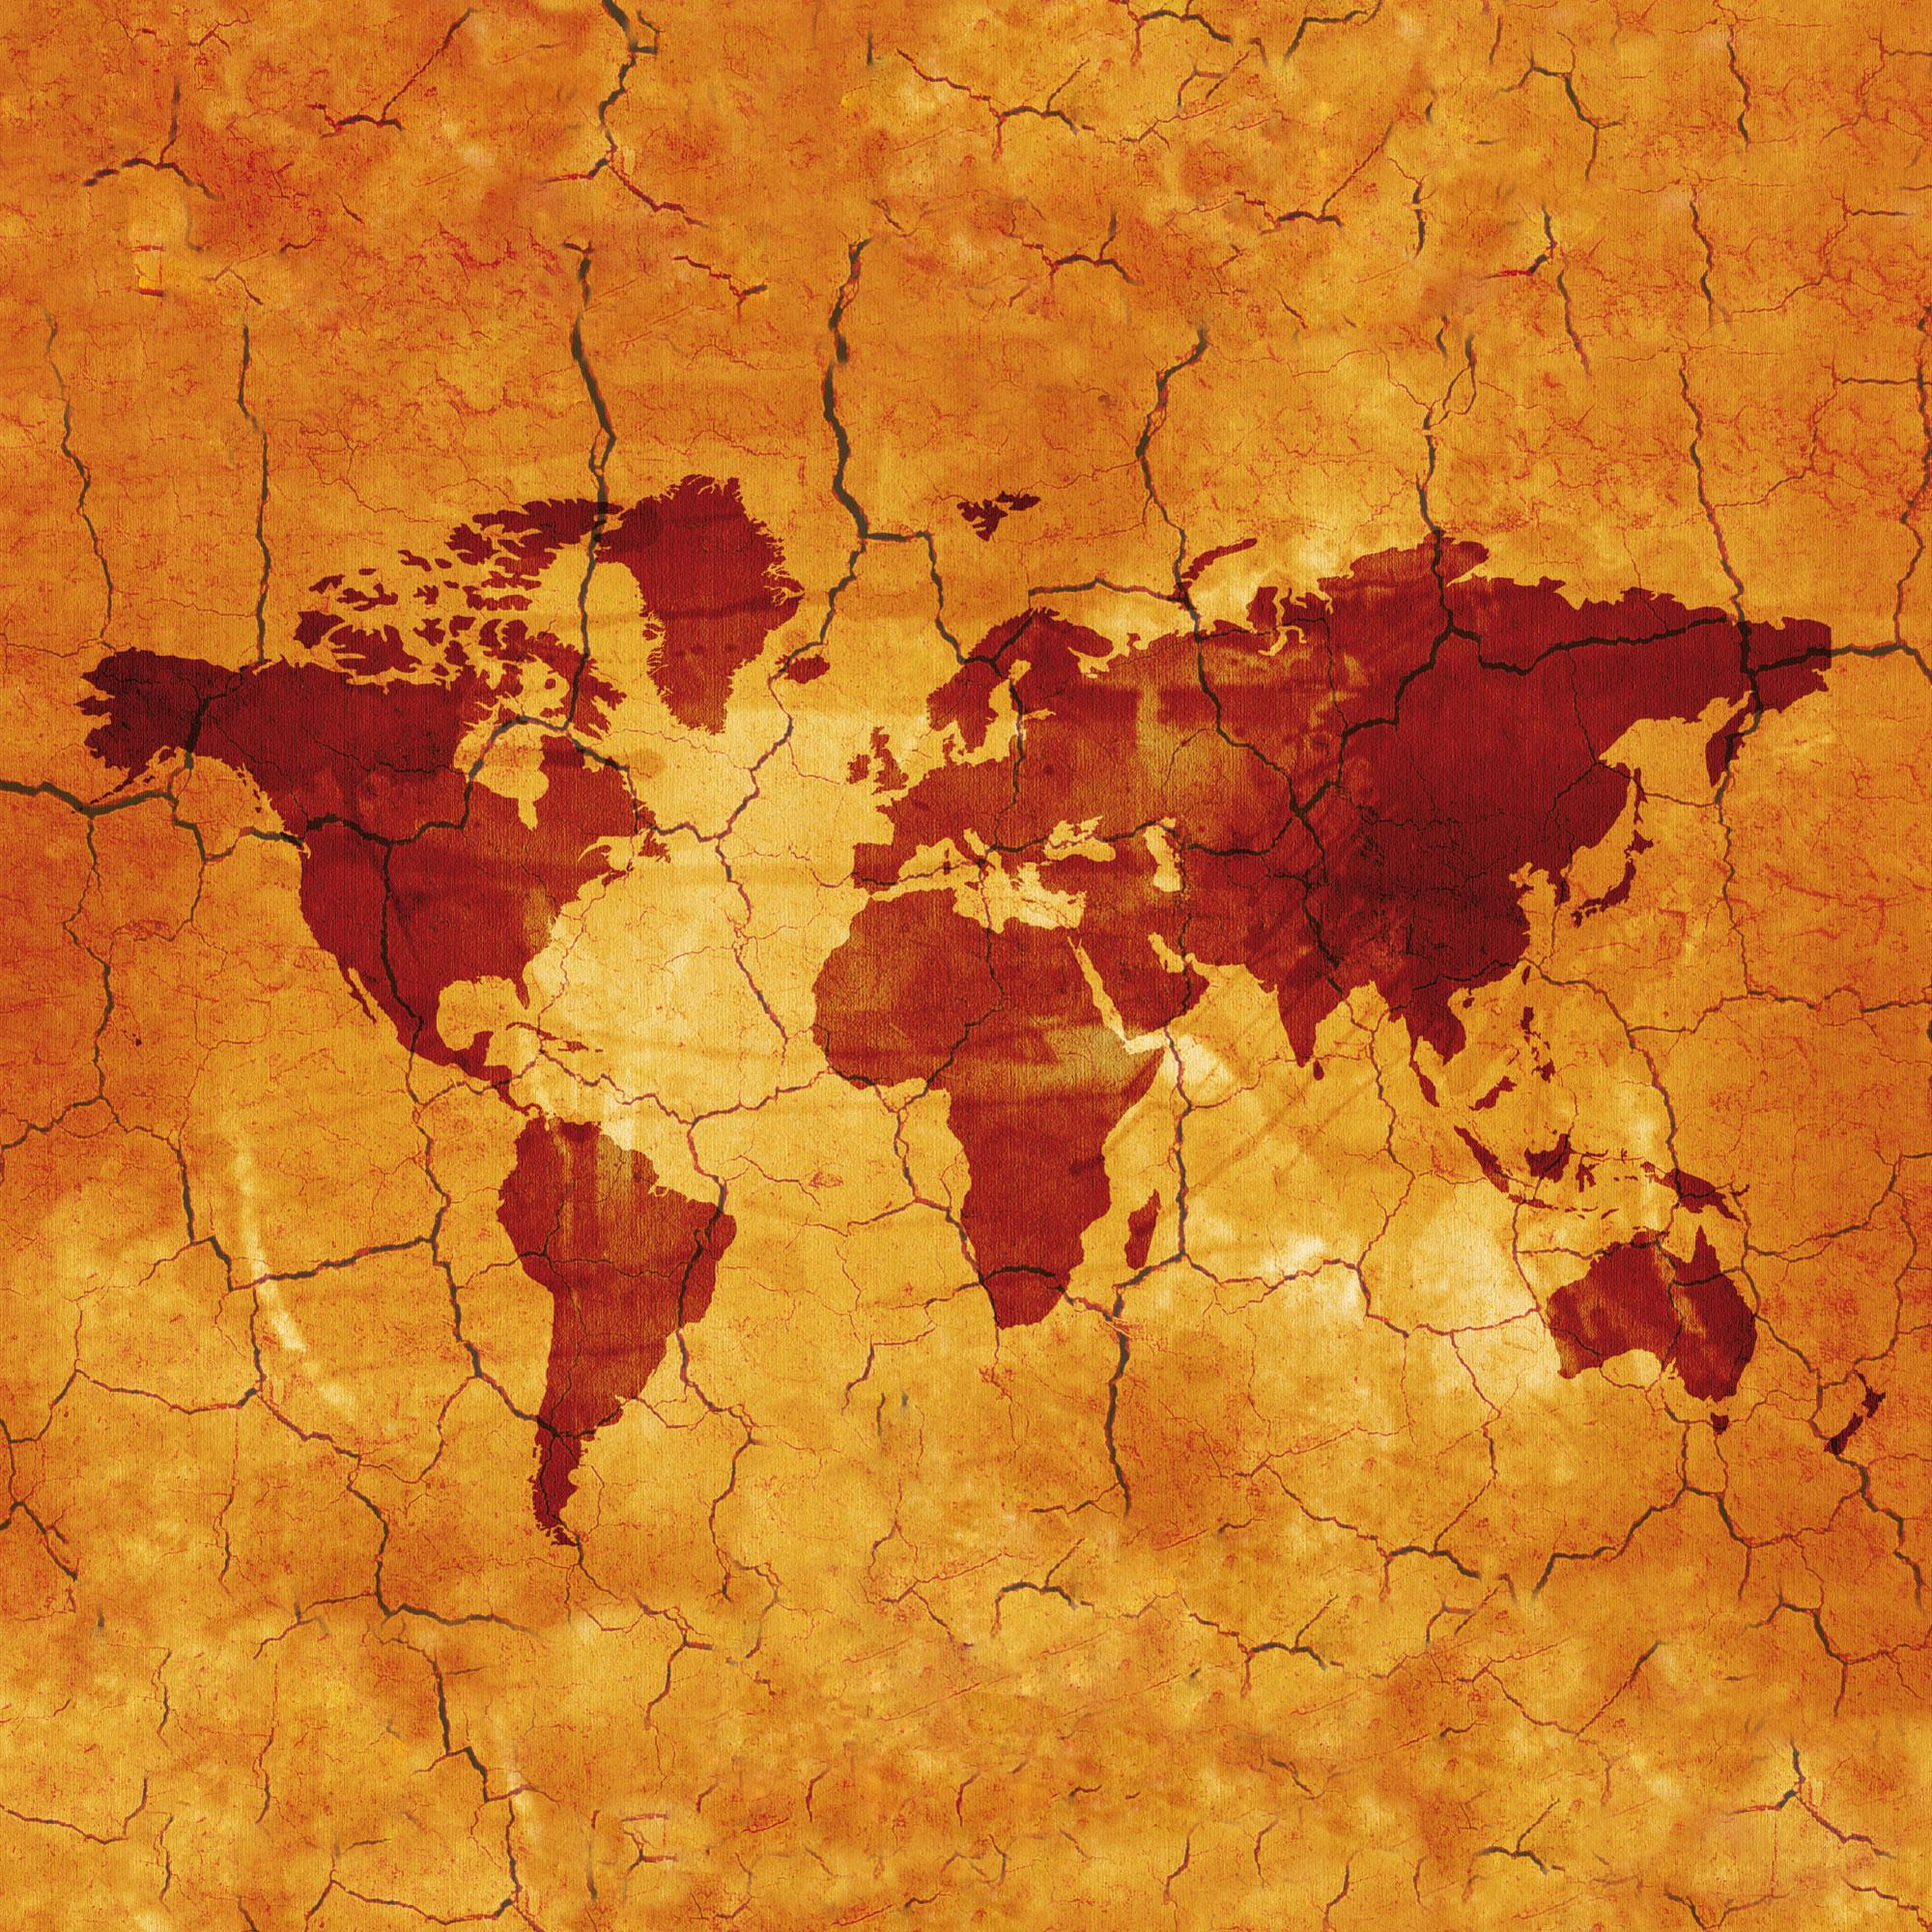 Landkarten - Antike Karte - Vintage Map - Gerahmte Topseller - 33x33x2,2